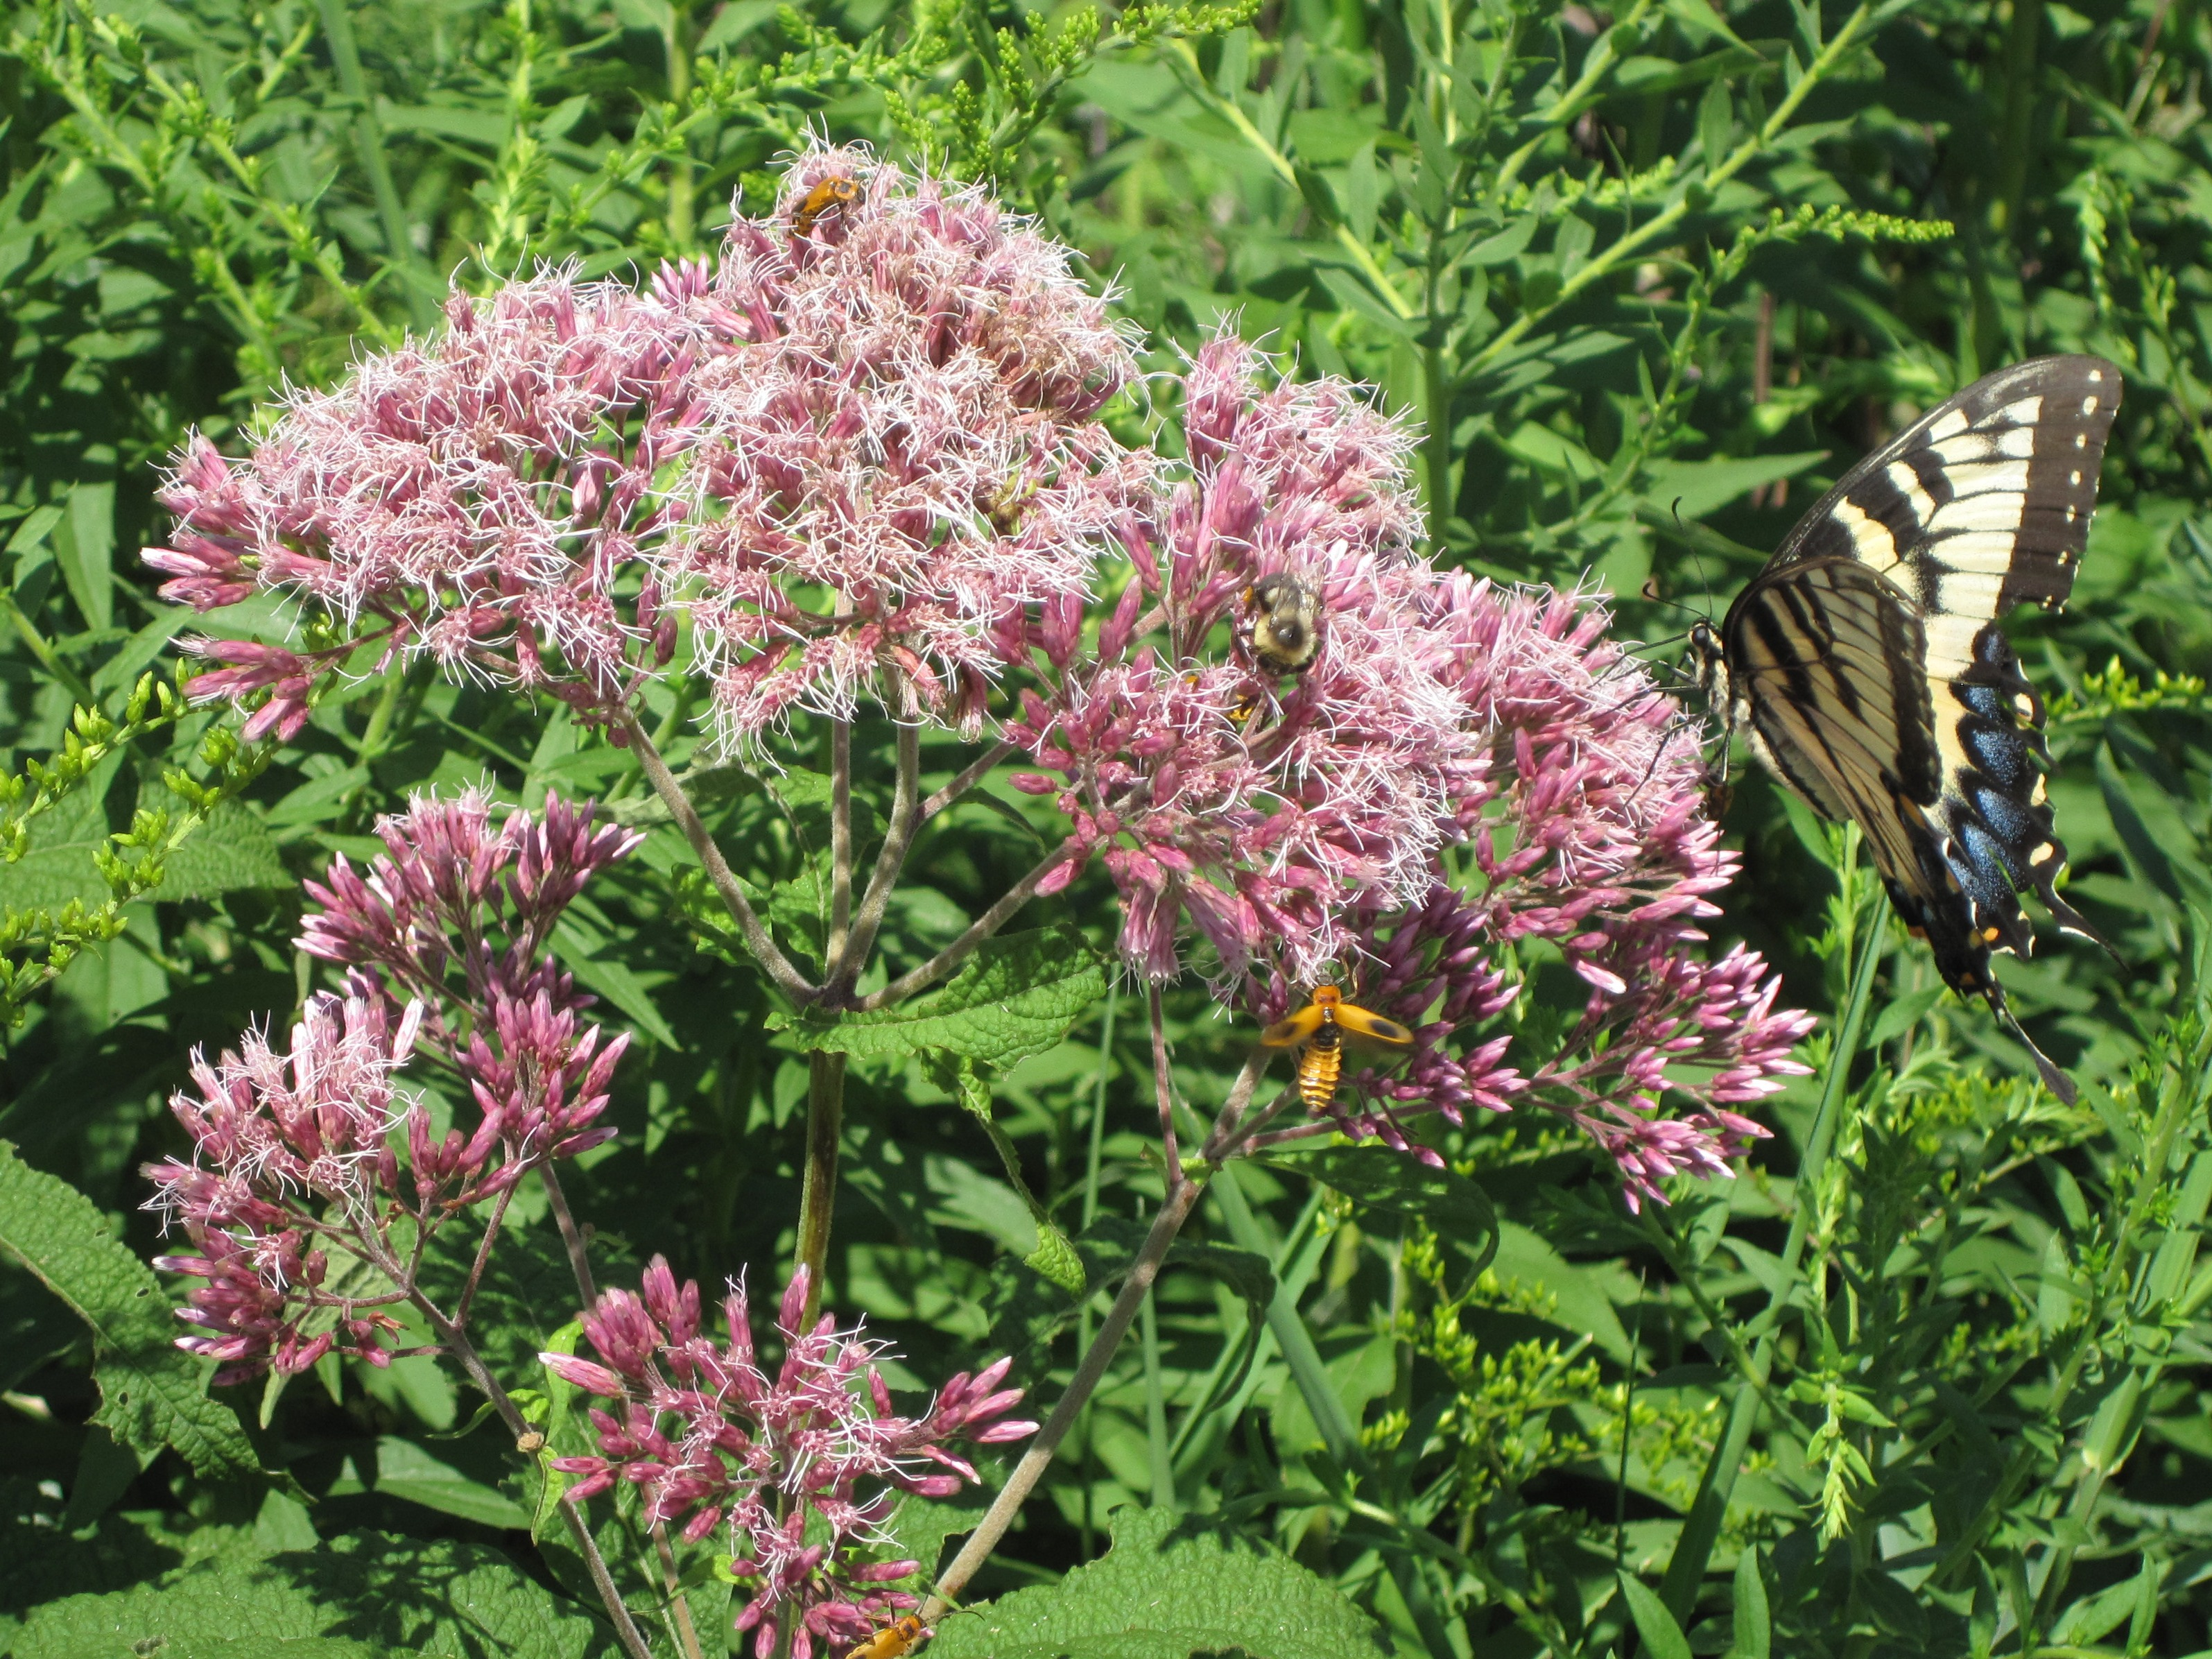 Eupatorium purpureum sweet joe pye weed citizens for for Joe pye weed